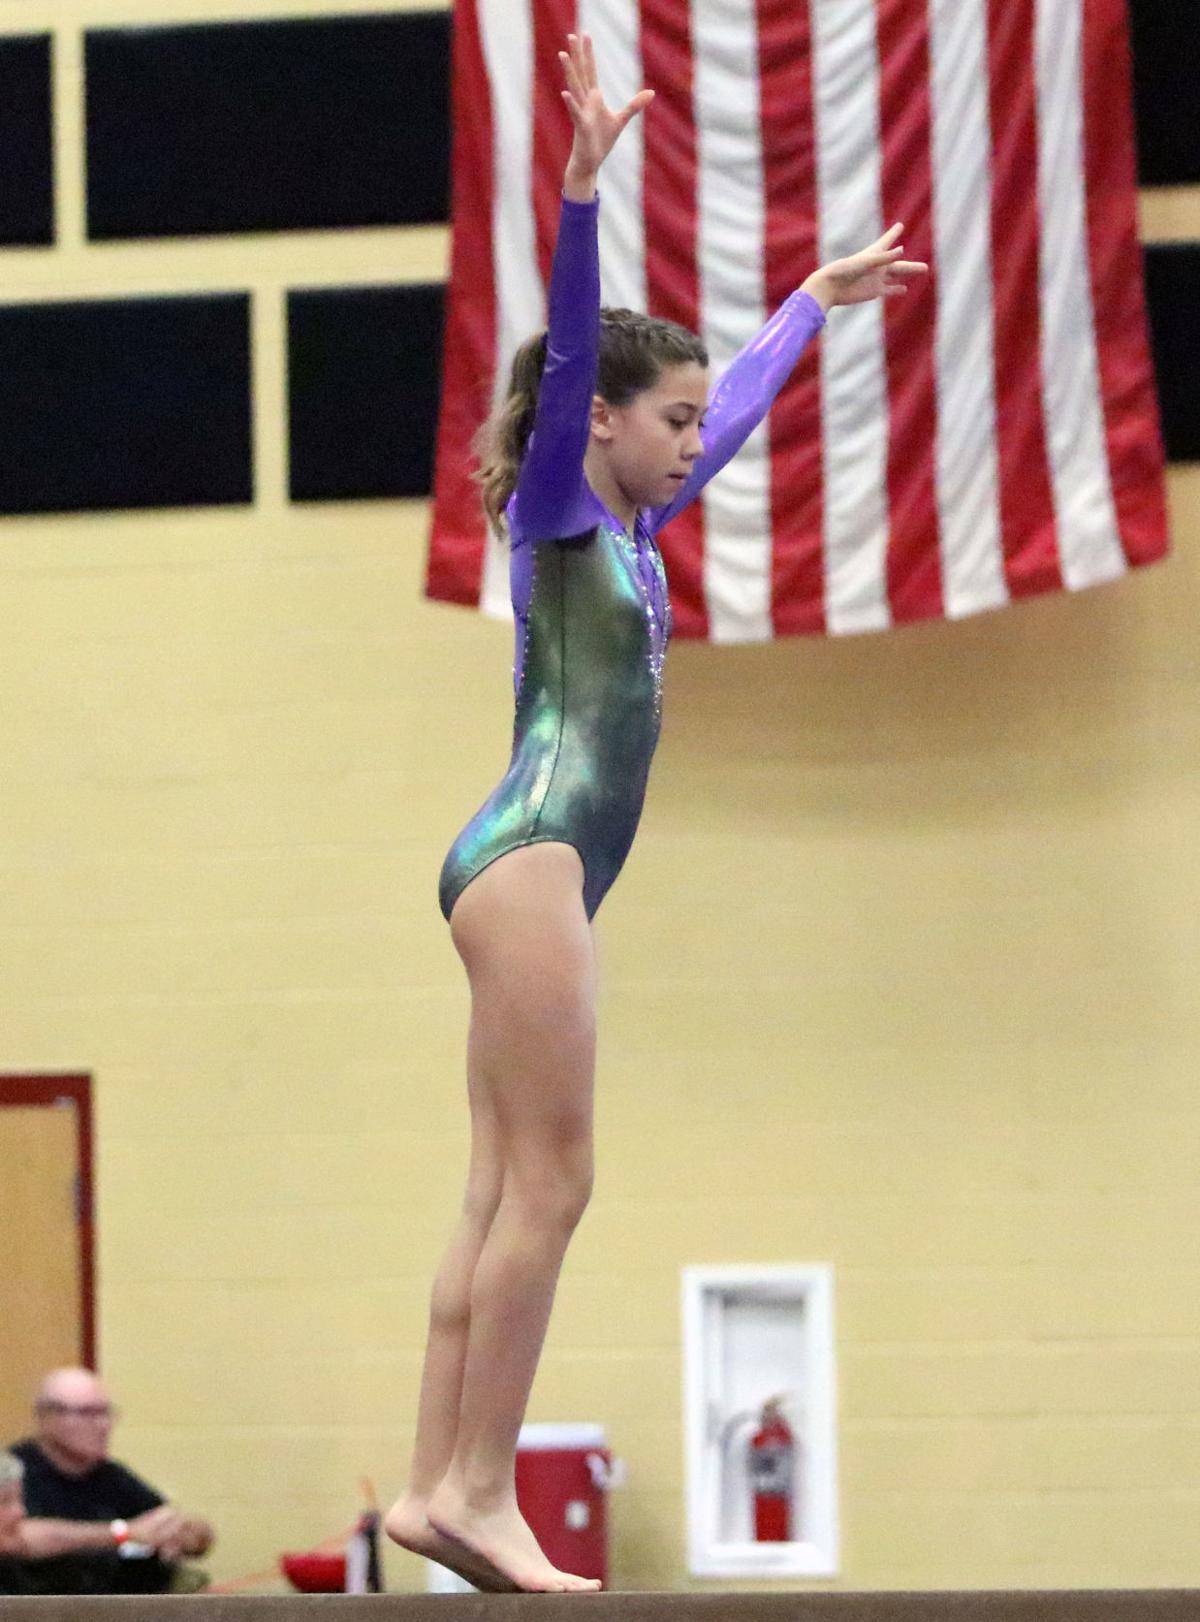 Hot gymnastics girls camel toe - Picsninja.club